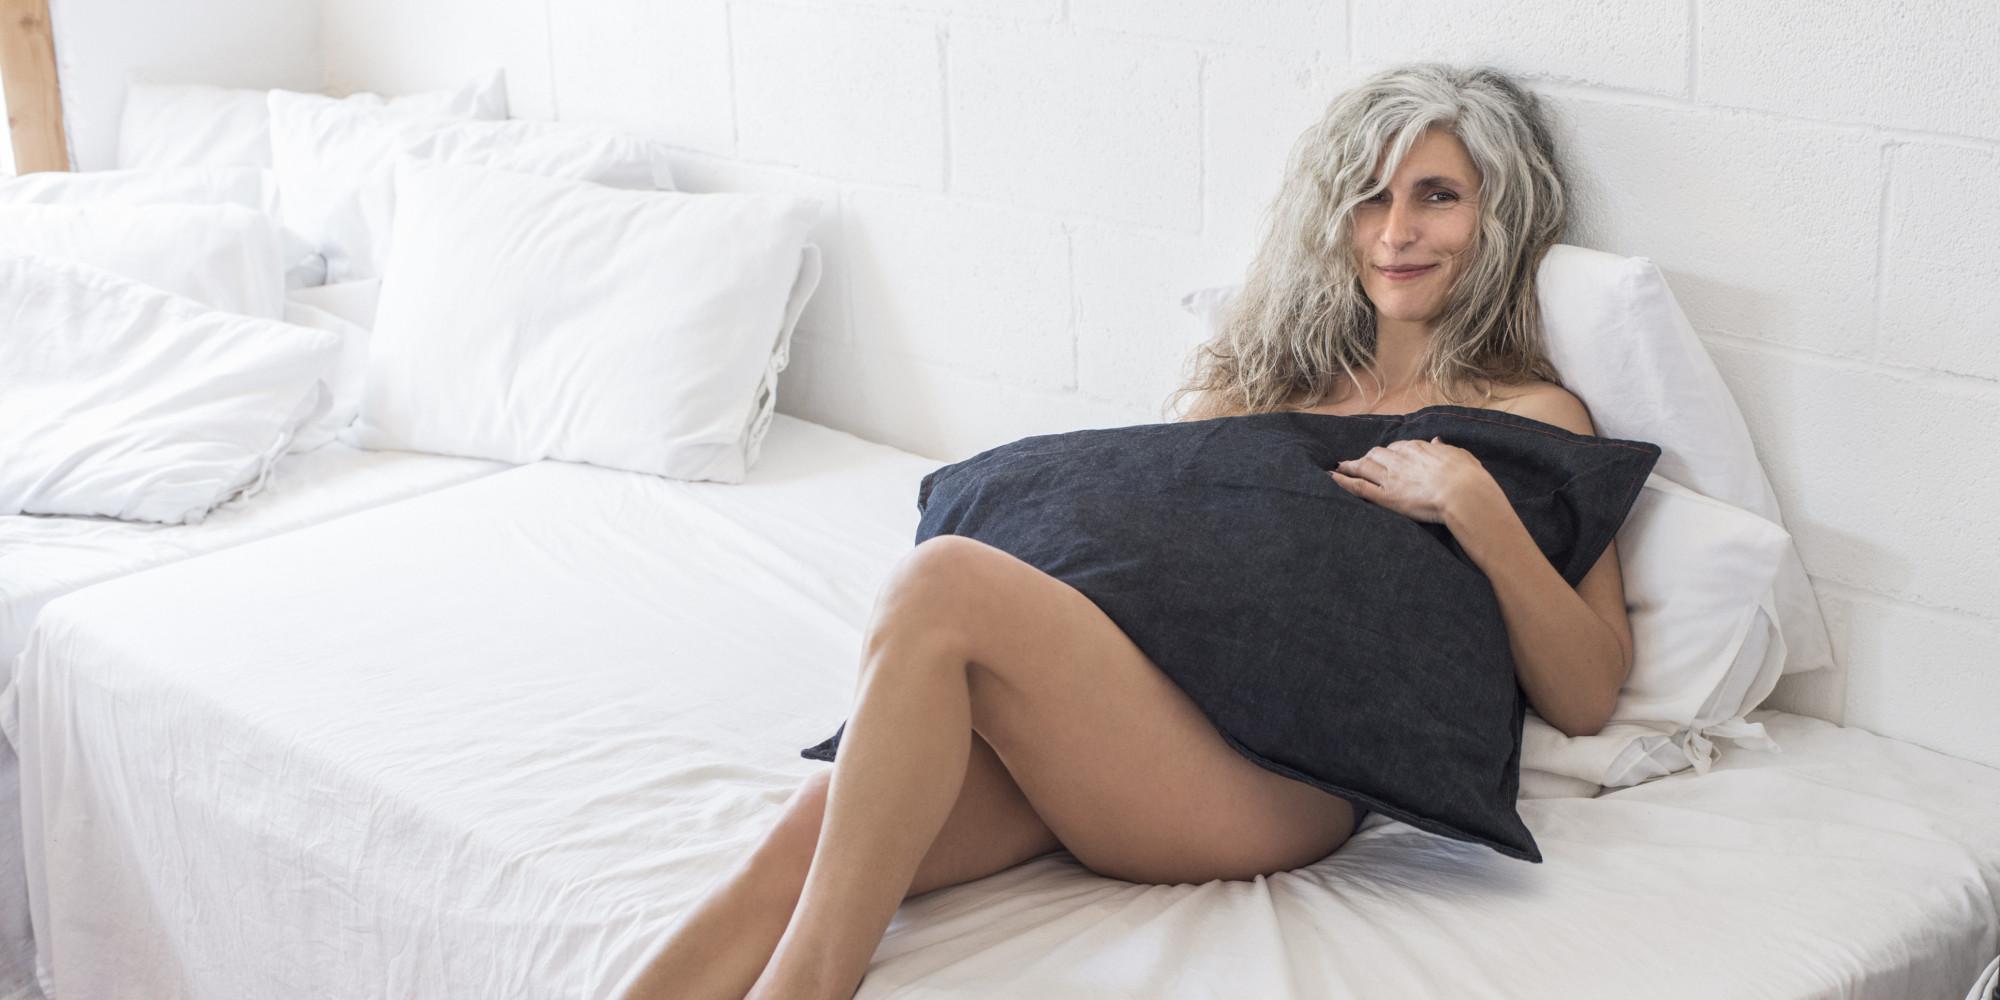 55 Woman Man To Seeking Slim 50